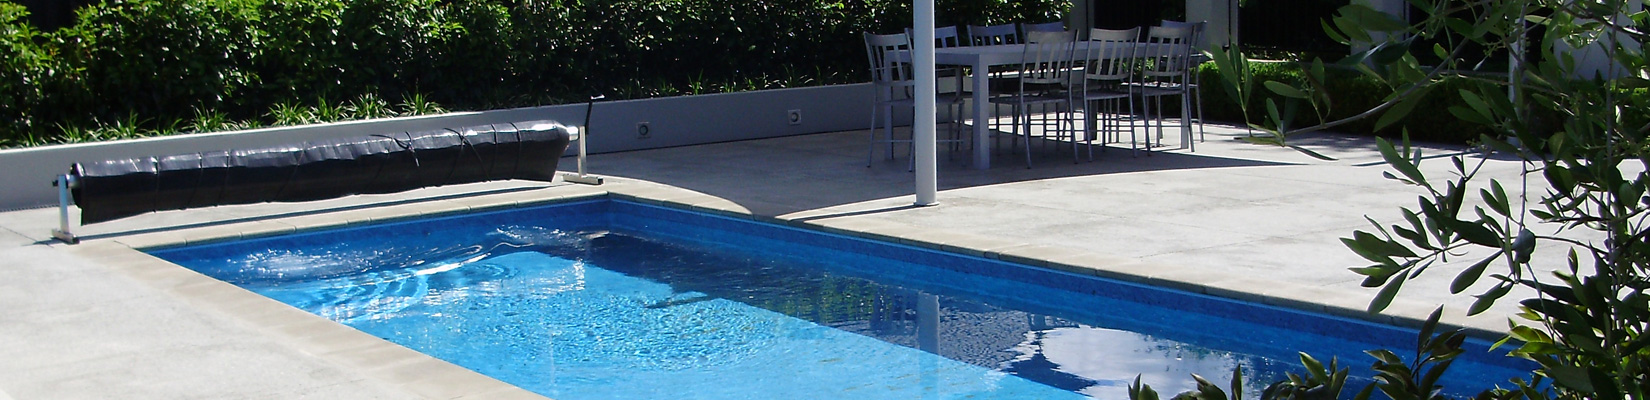 pool-and-pump-world-ashburton-mid-canterbury-home-slider-3